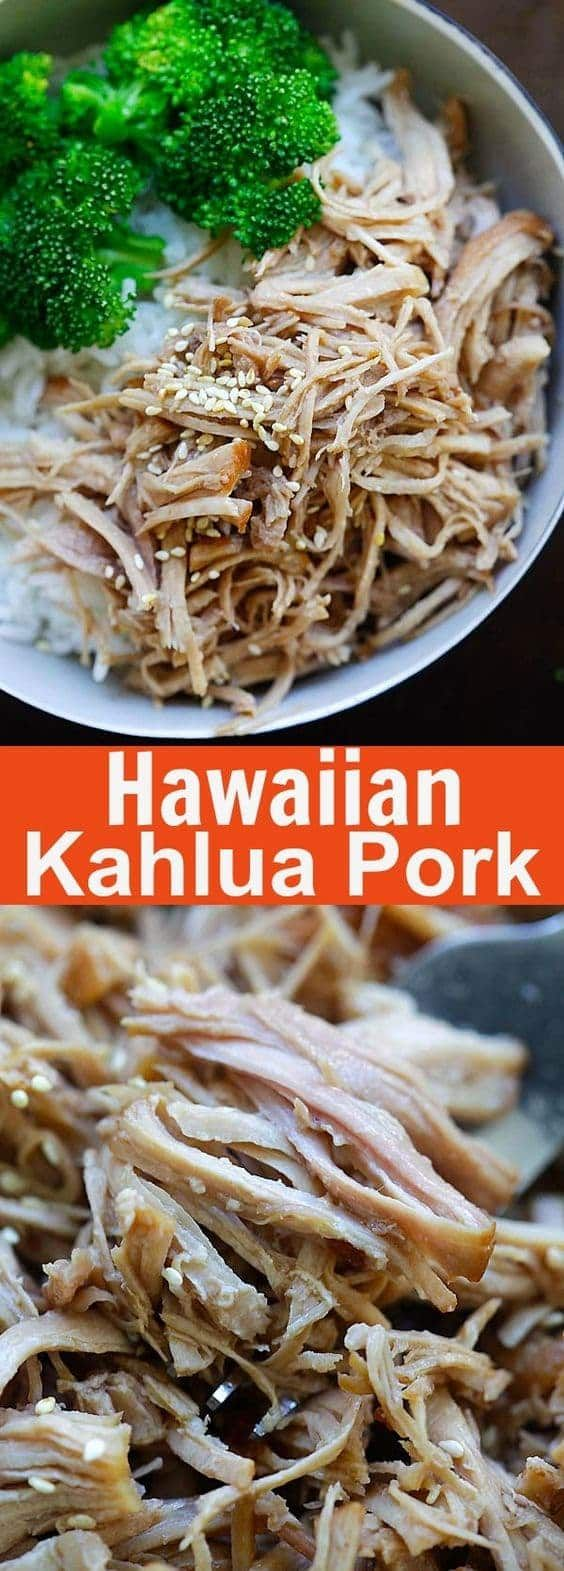 Hawaiian Kalua Pork - tender and juicy pressure cooker Hawaiian Kalua pork recipe. 10 mins active time and dinner is done   rasamalaysia.com